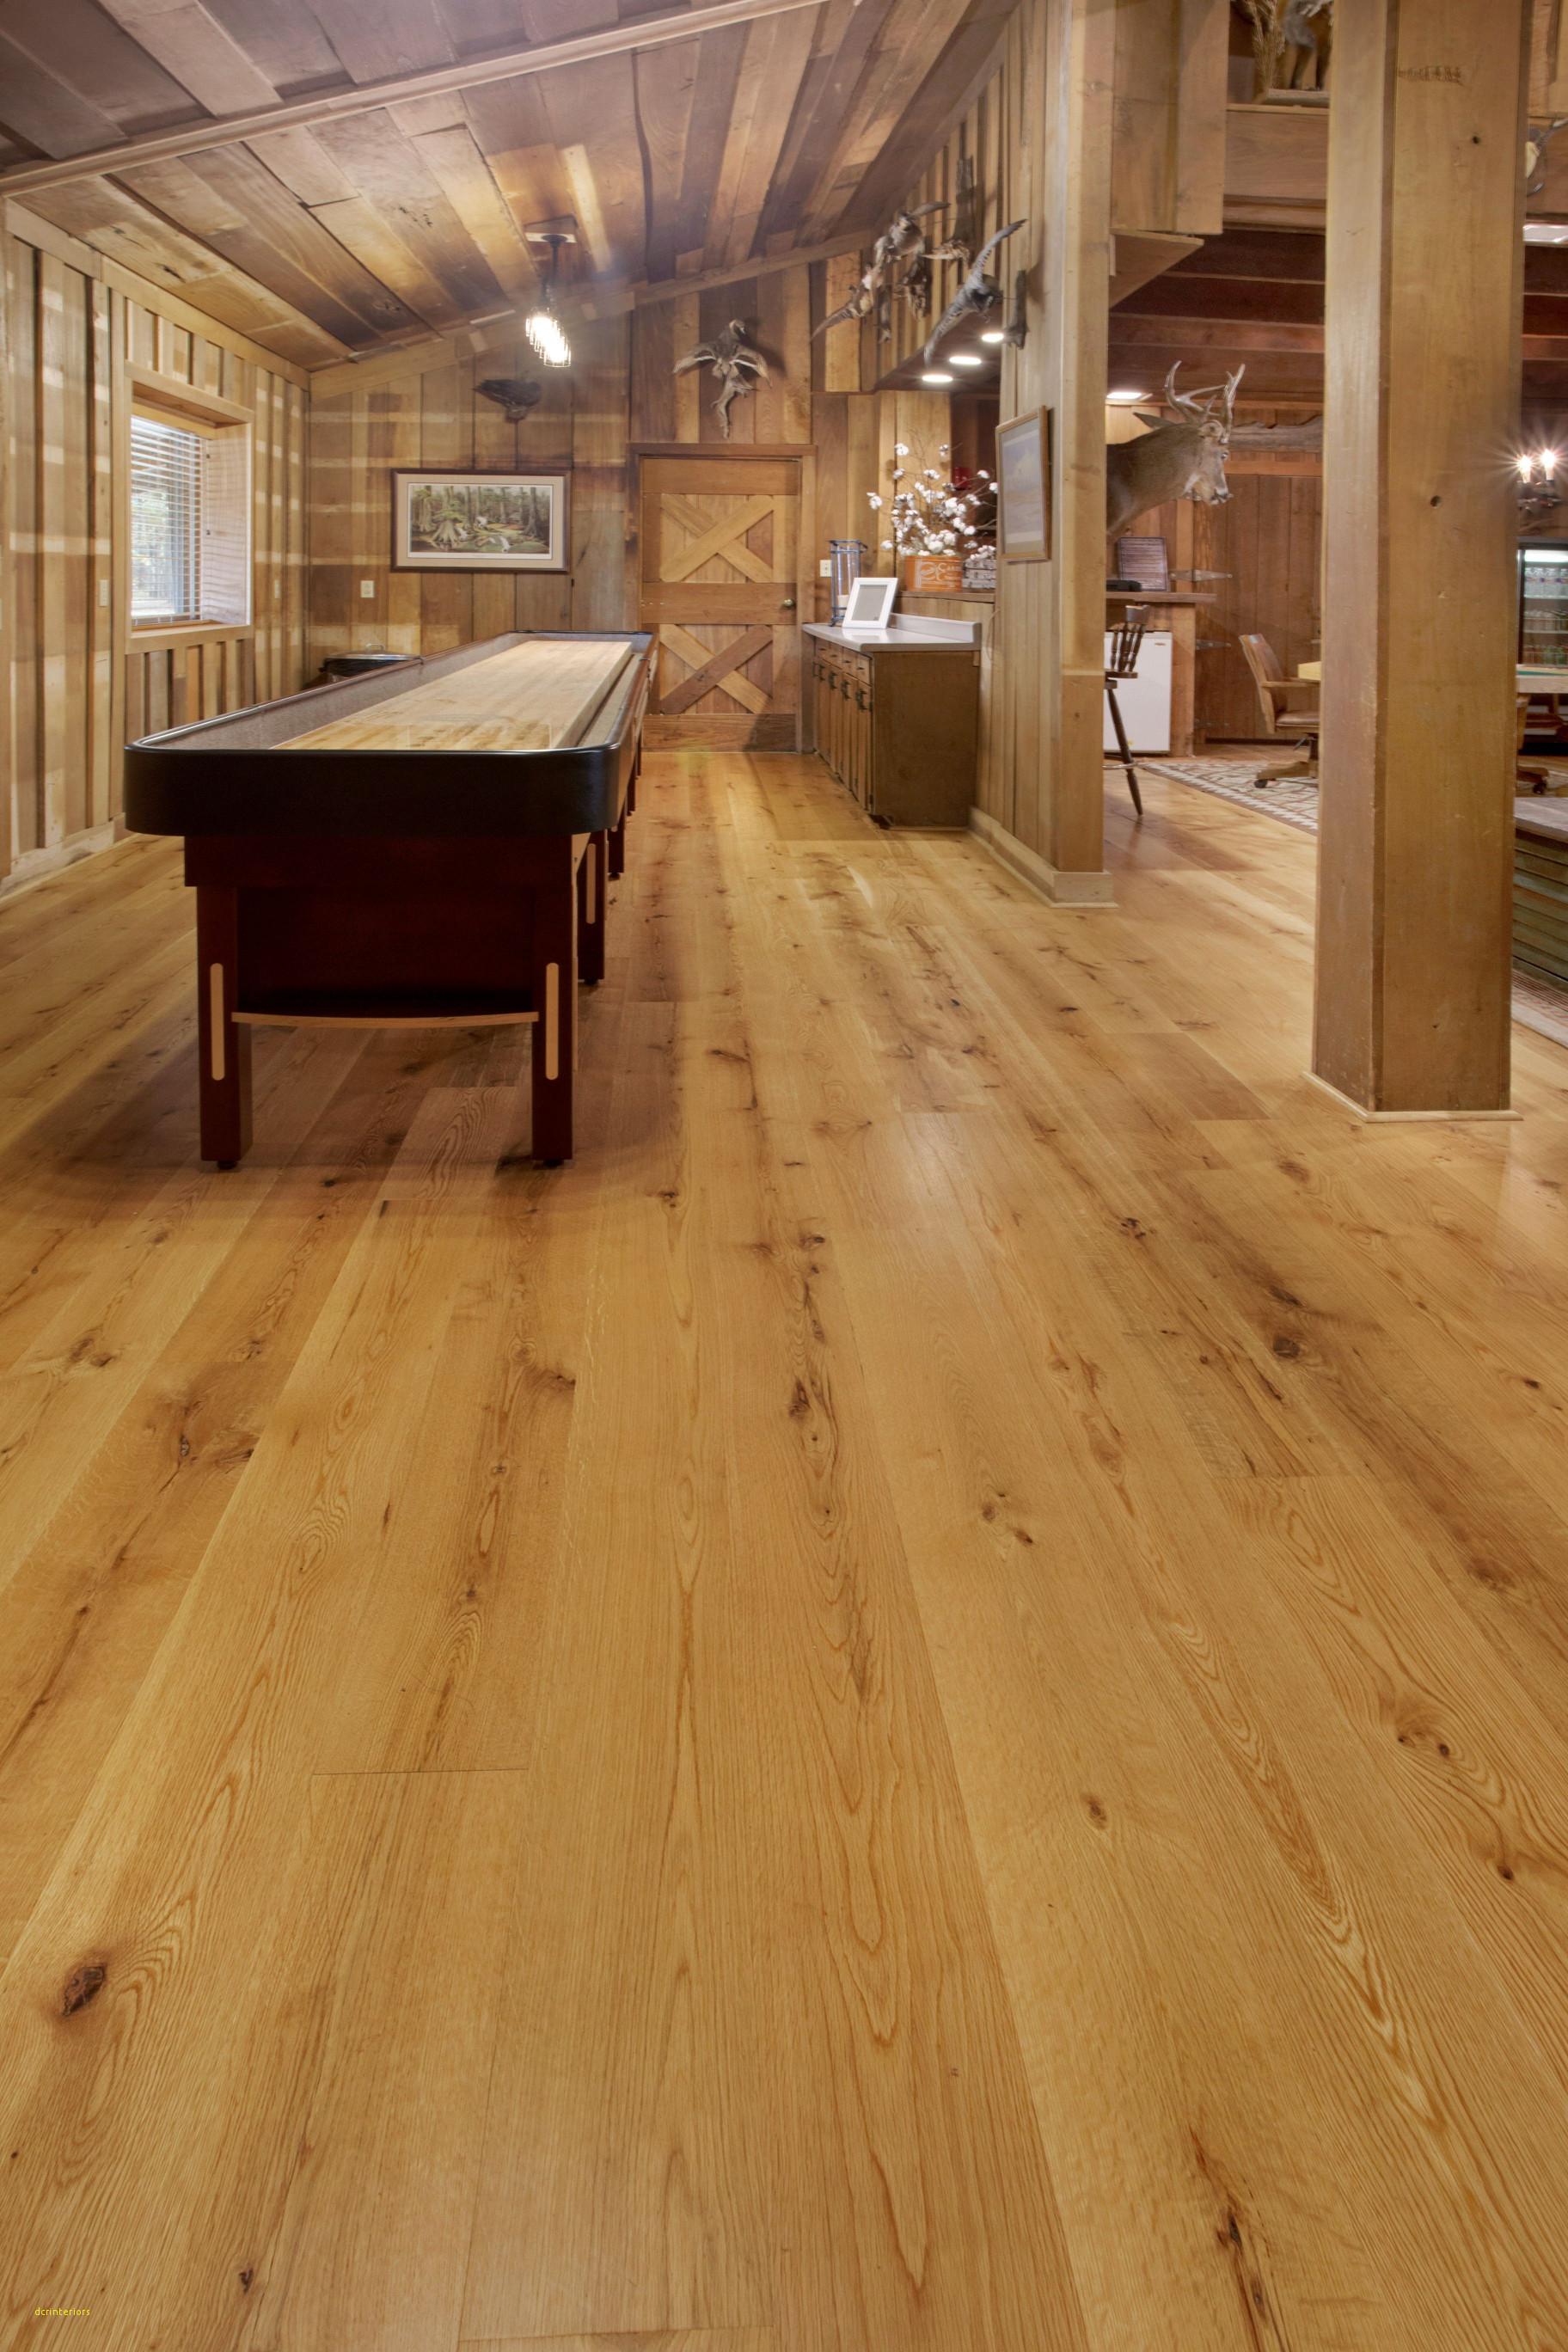 30 Cute Hardwood Flooring toronto 2021 free download hardwood flooring toronto of bathroom flooring cool stone kitchen flooring inspirational floor regarding 24 elegant unfinished wood flooring layout